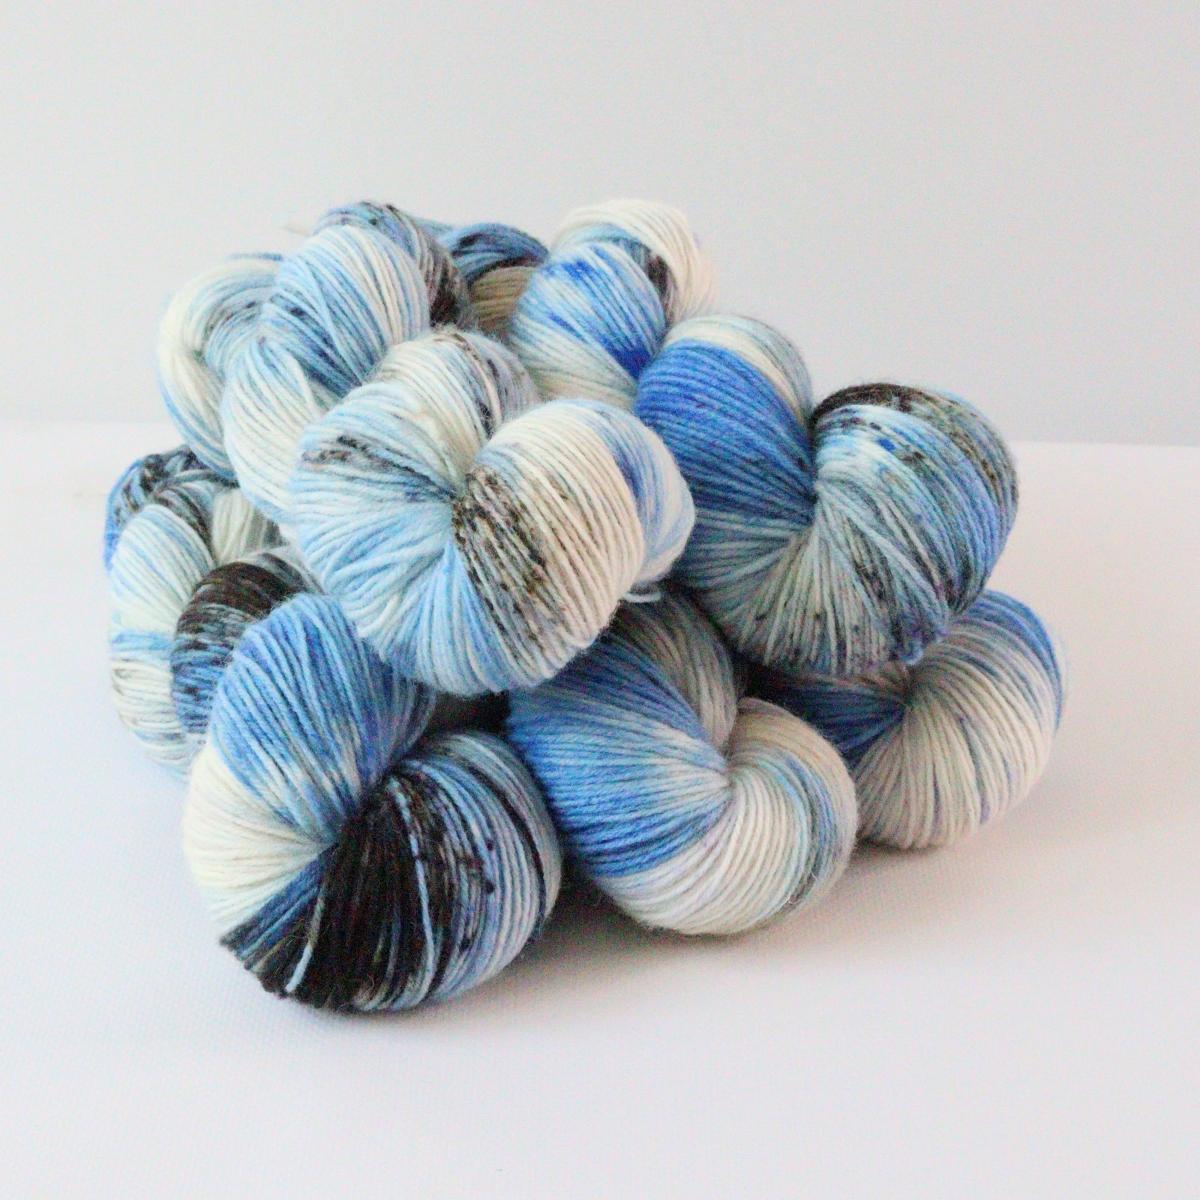 woodico.pro hand dyed yarn 081 1 1200x1200 - Hand dyed yarn / 081